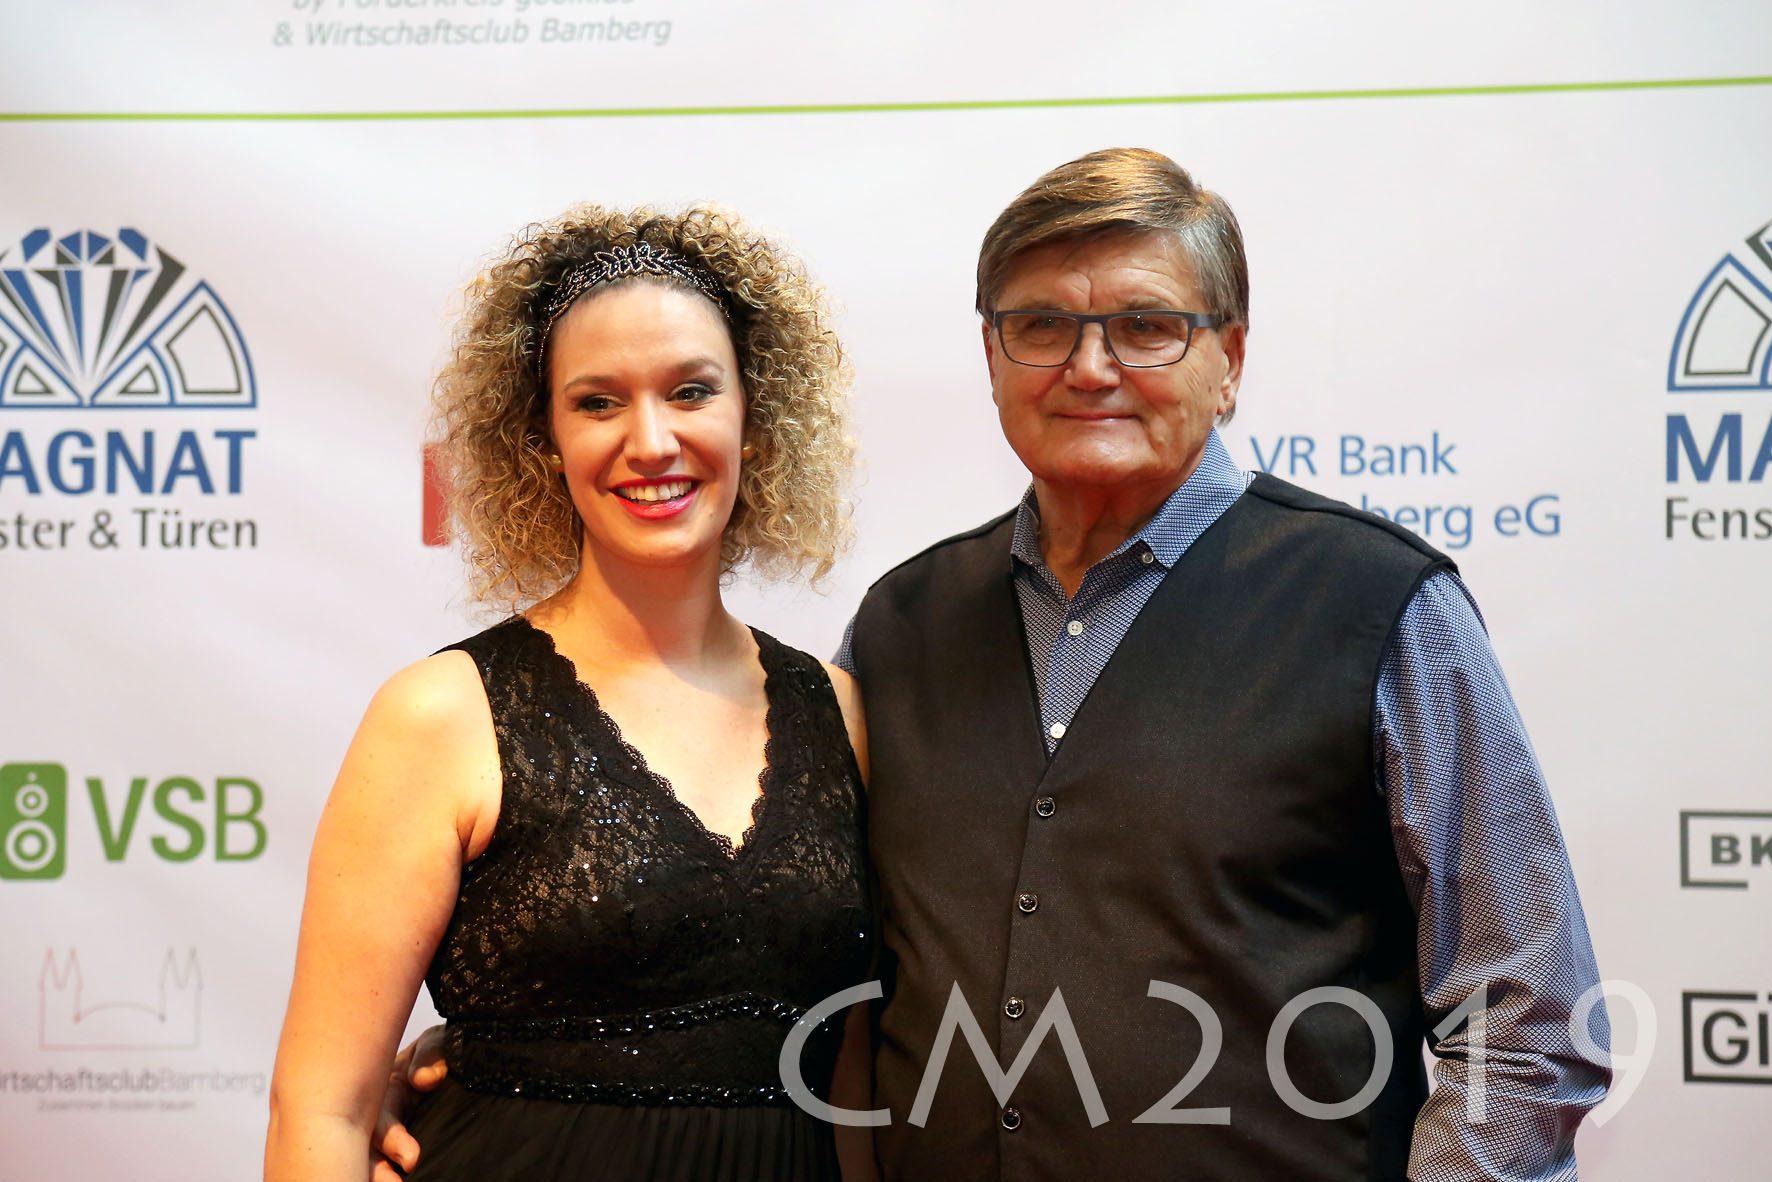 Magnat Sportgala 2019, Anna Niedermeier und Hans Meyer, Autor: Charlotte Moser